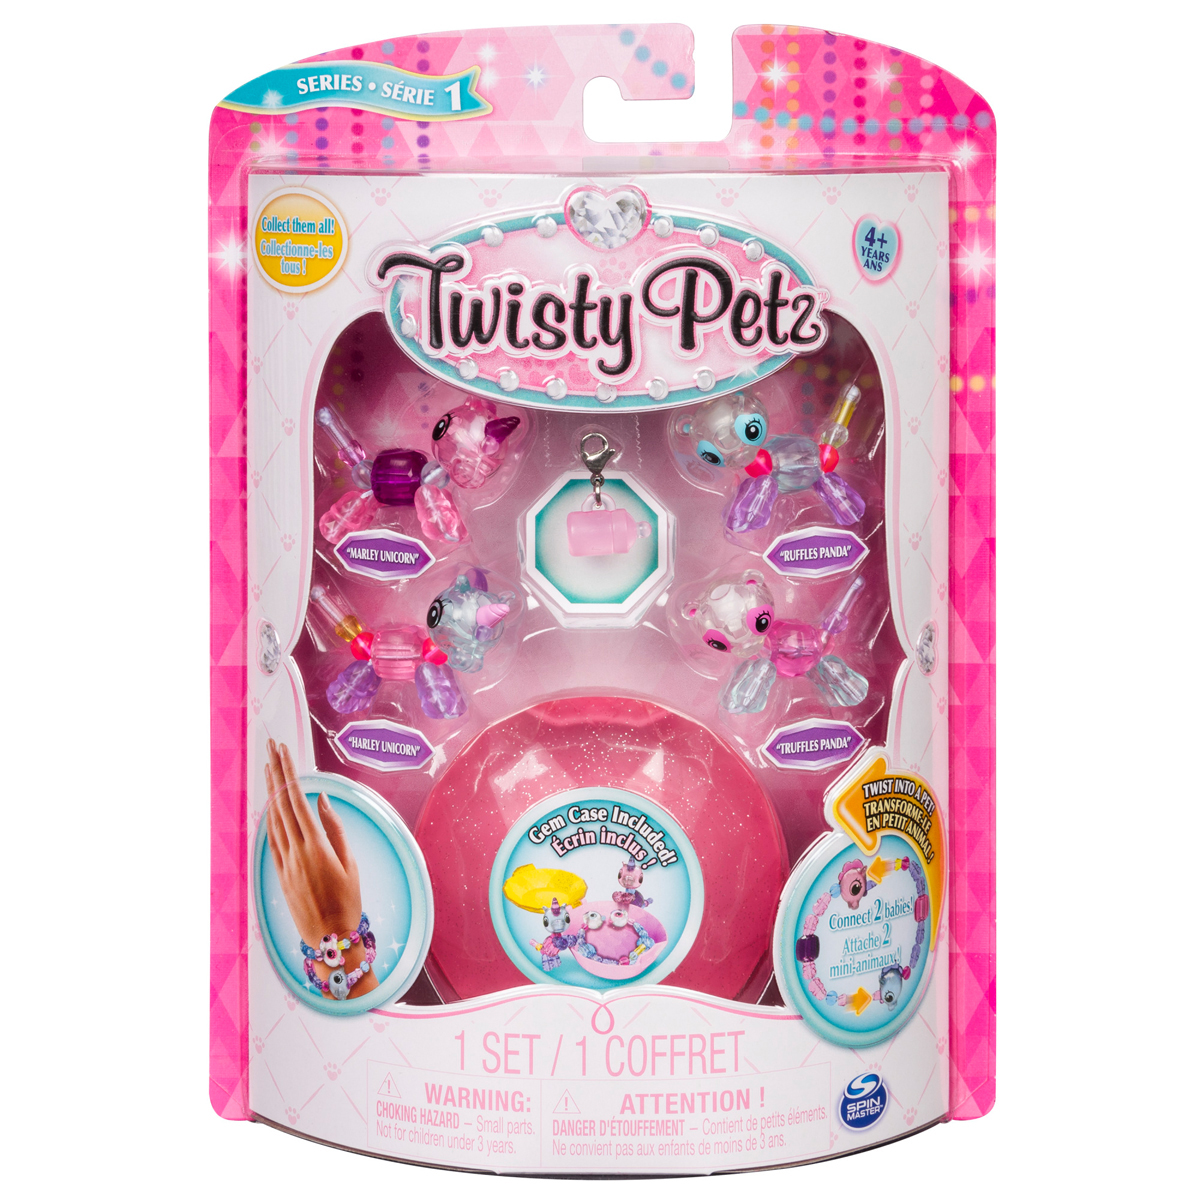 Twisty Petz Babies 4-pack